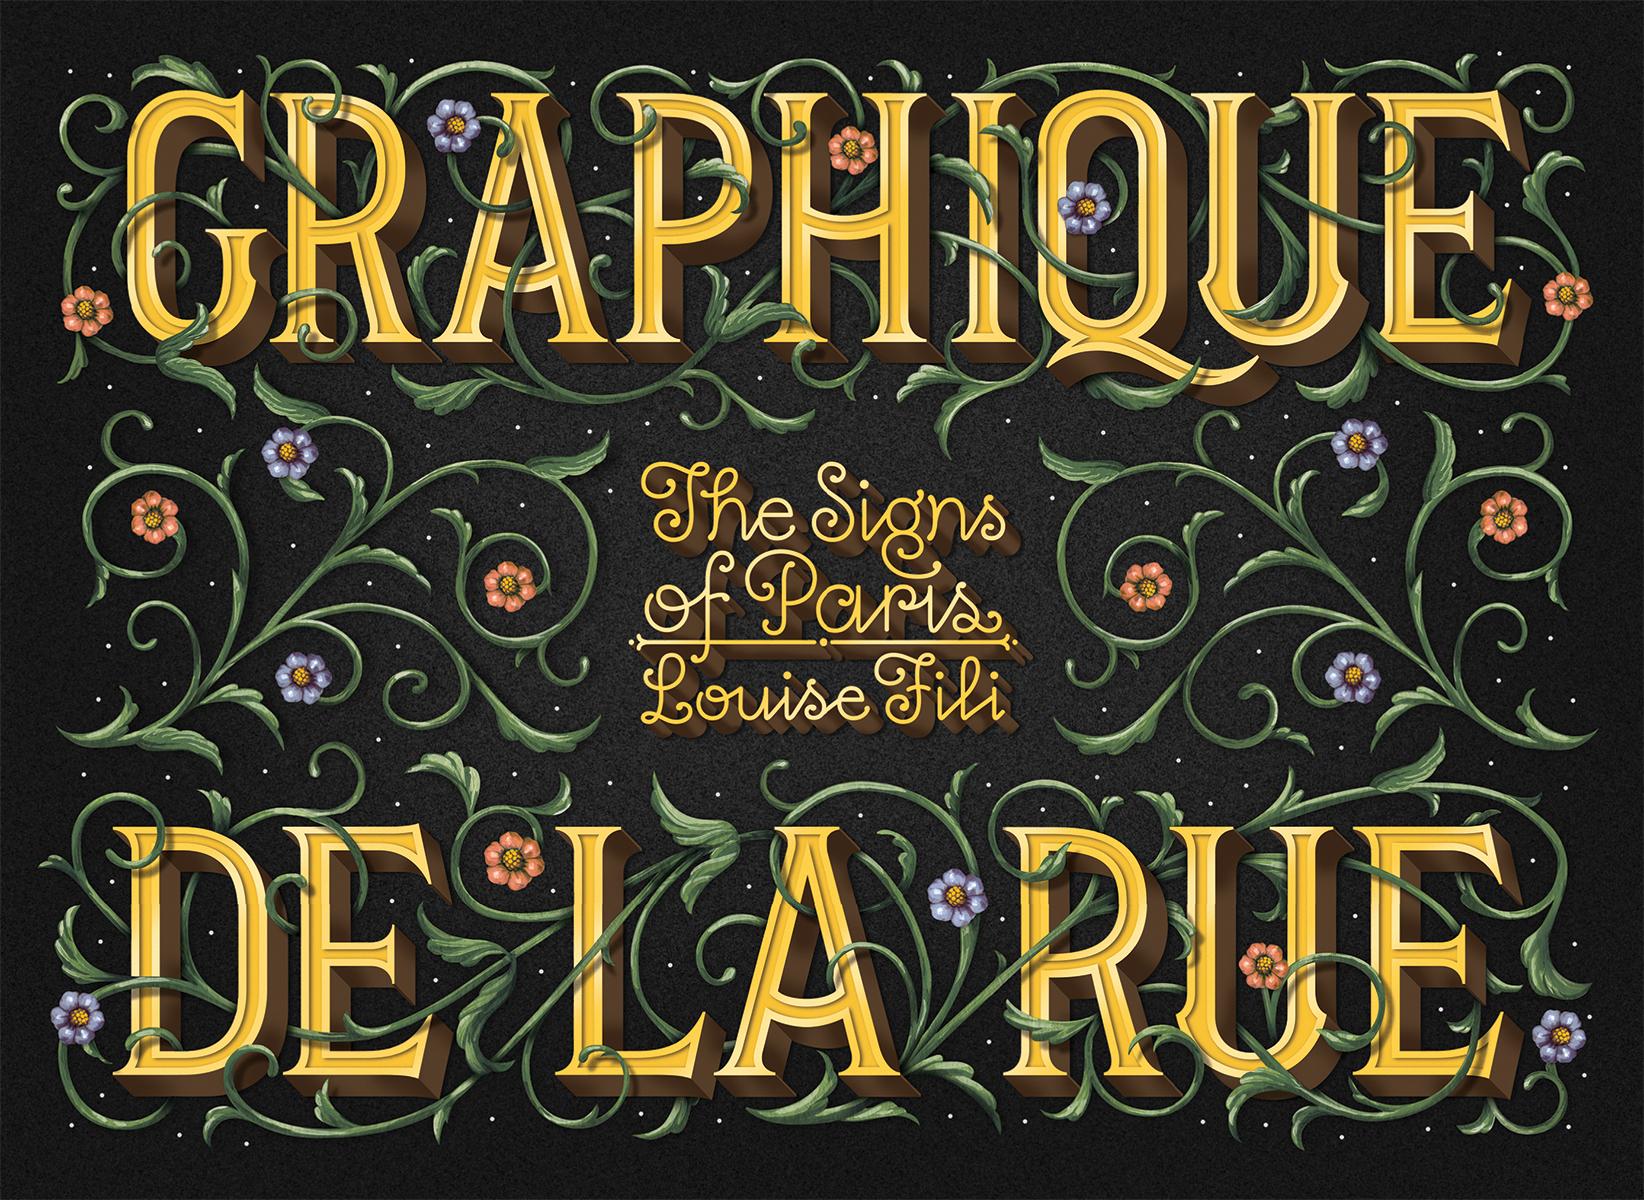 Graphique Cover r5